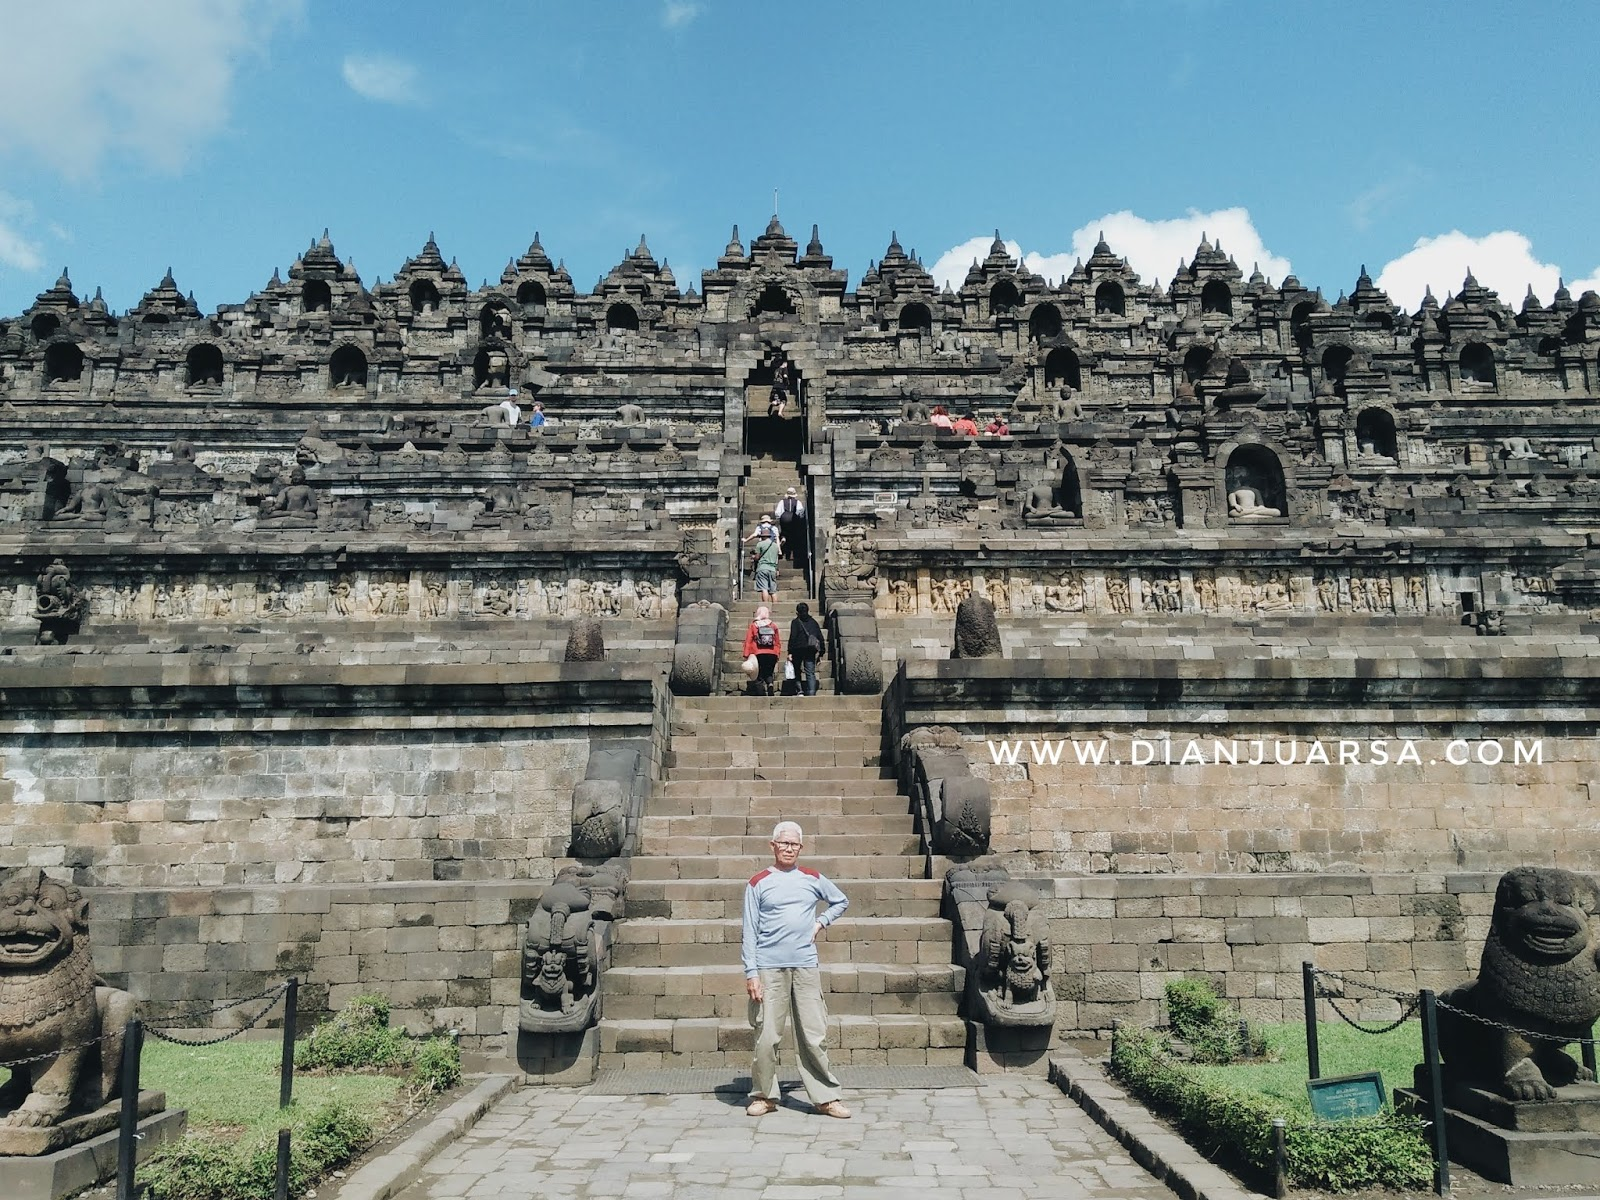 Wisata Candi di Yogyakarta dalam sehari bersama keluarga - Untold